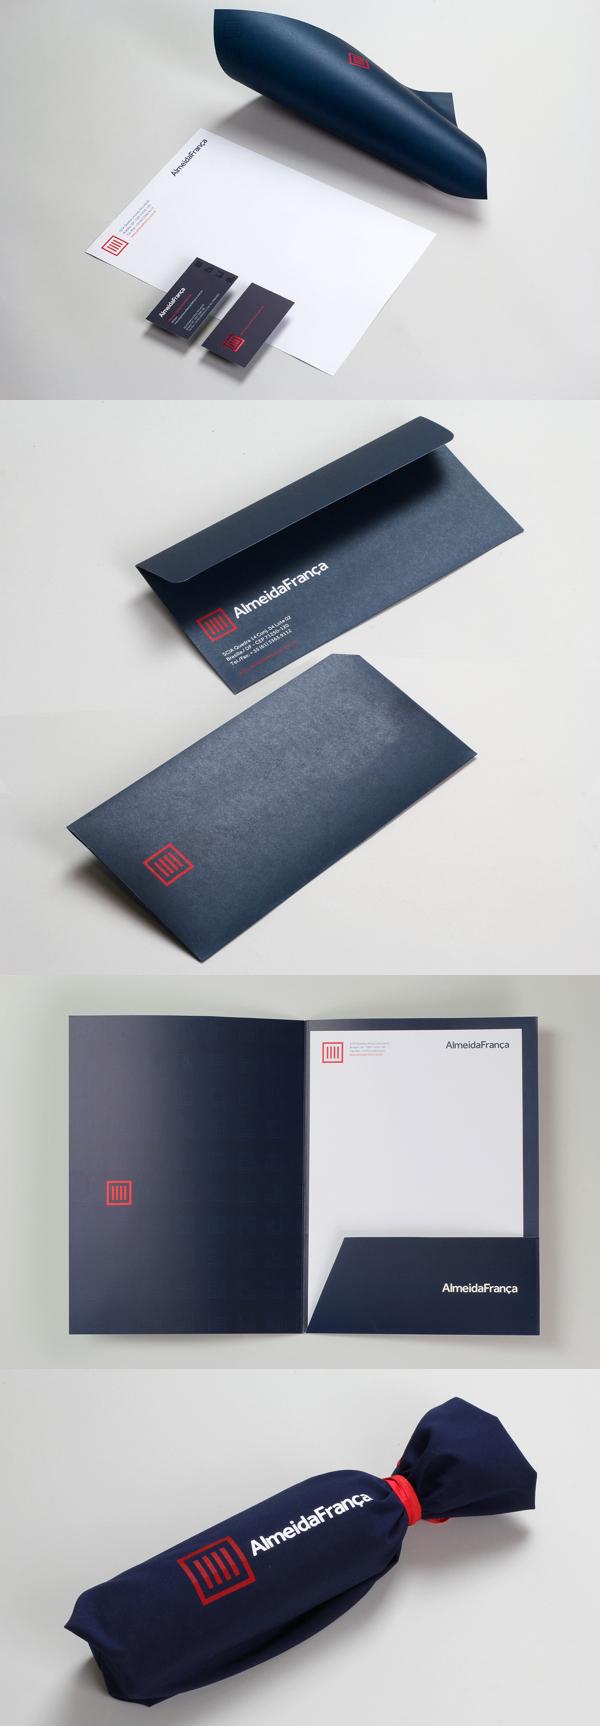 Almeida Franca Branding Stationery